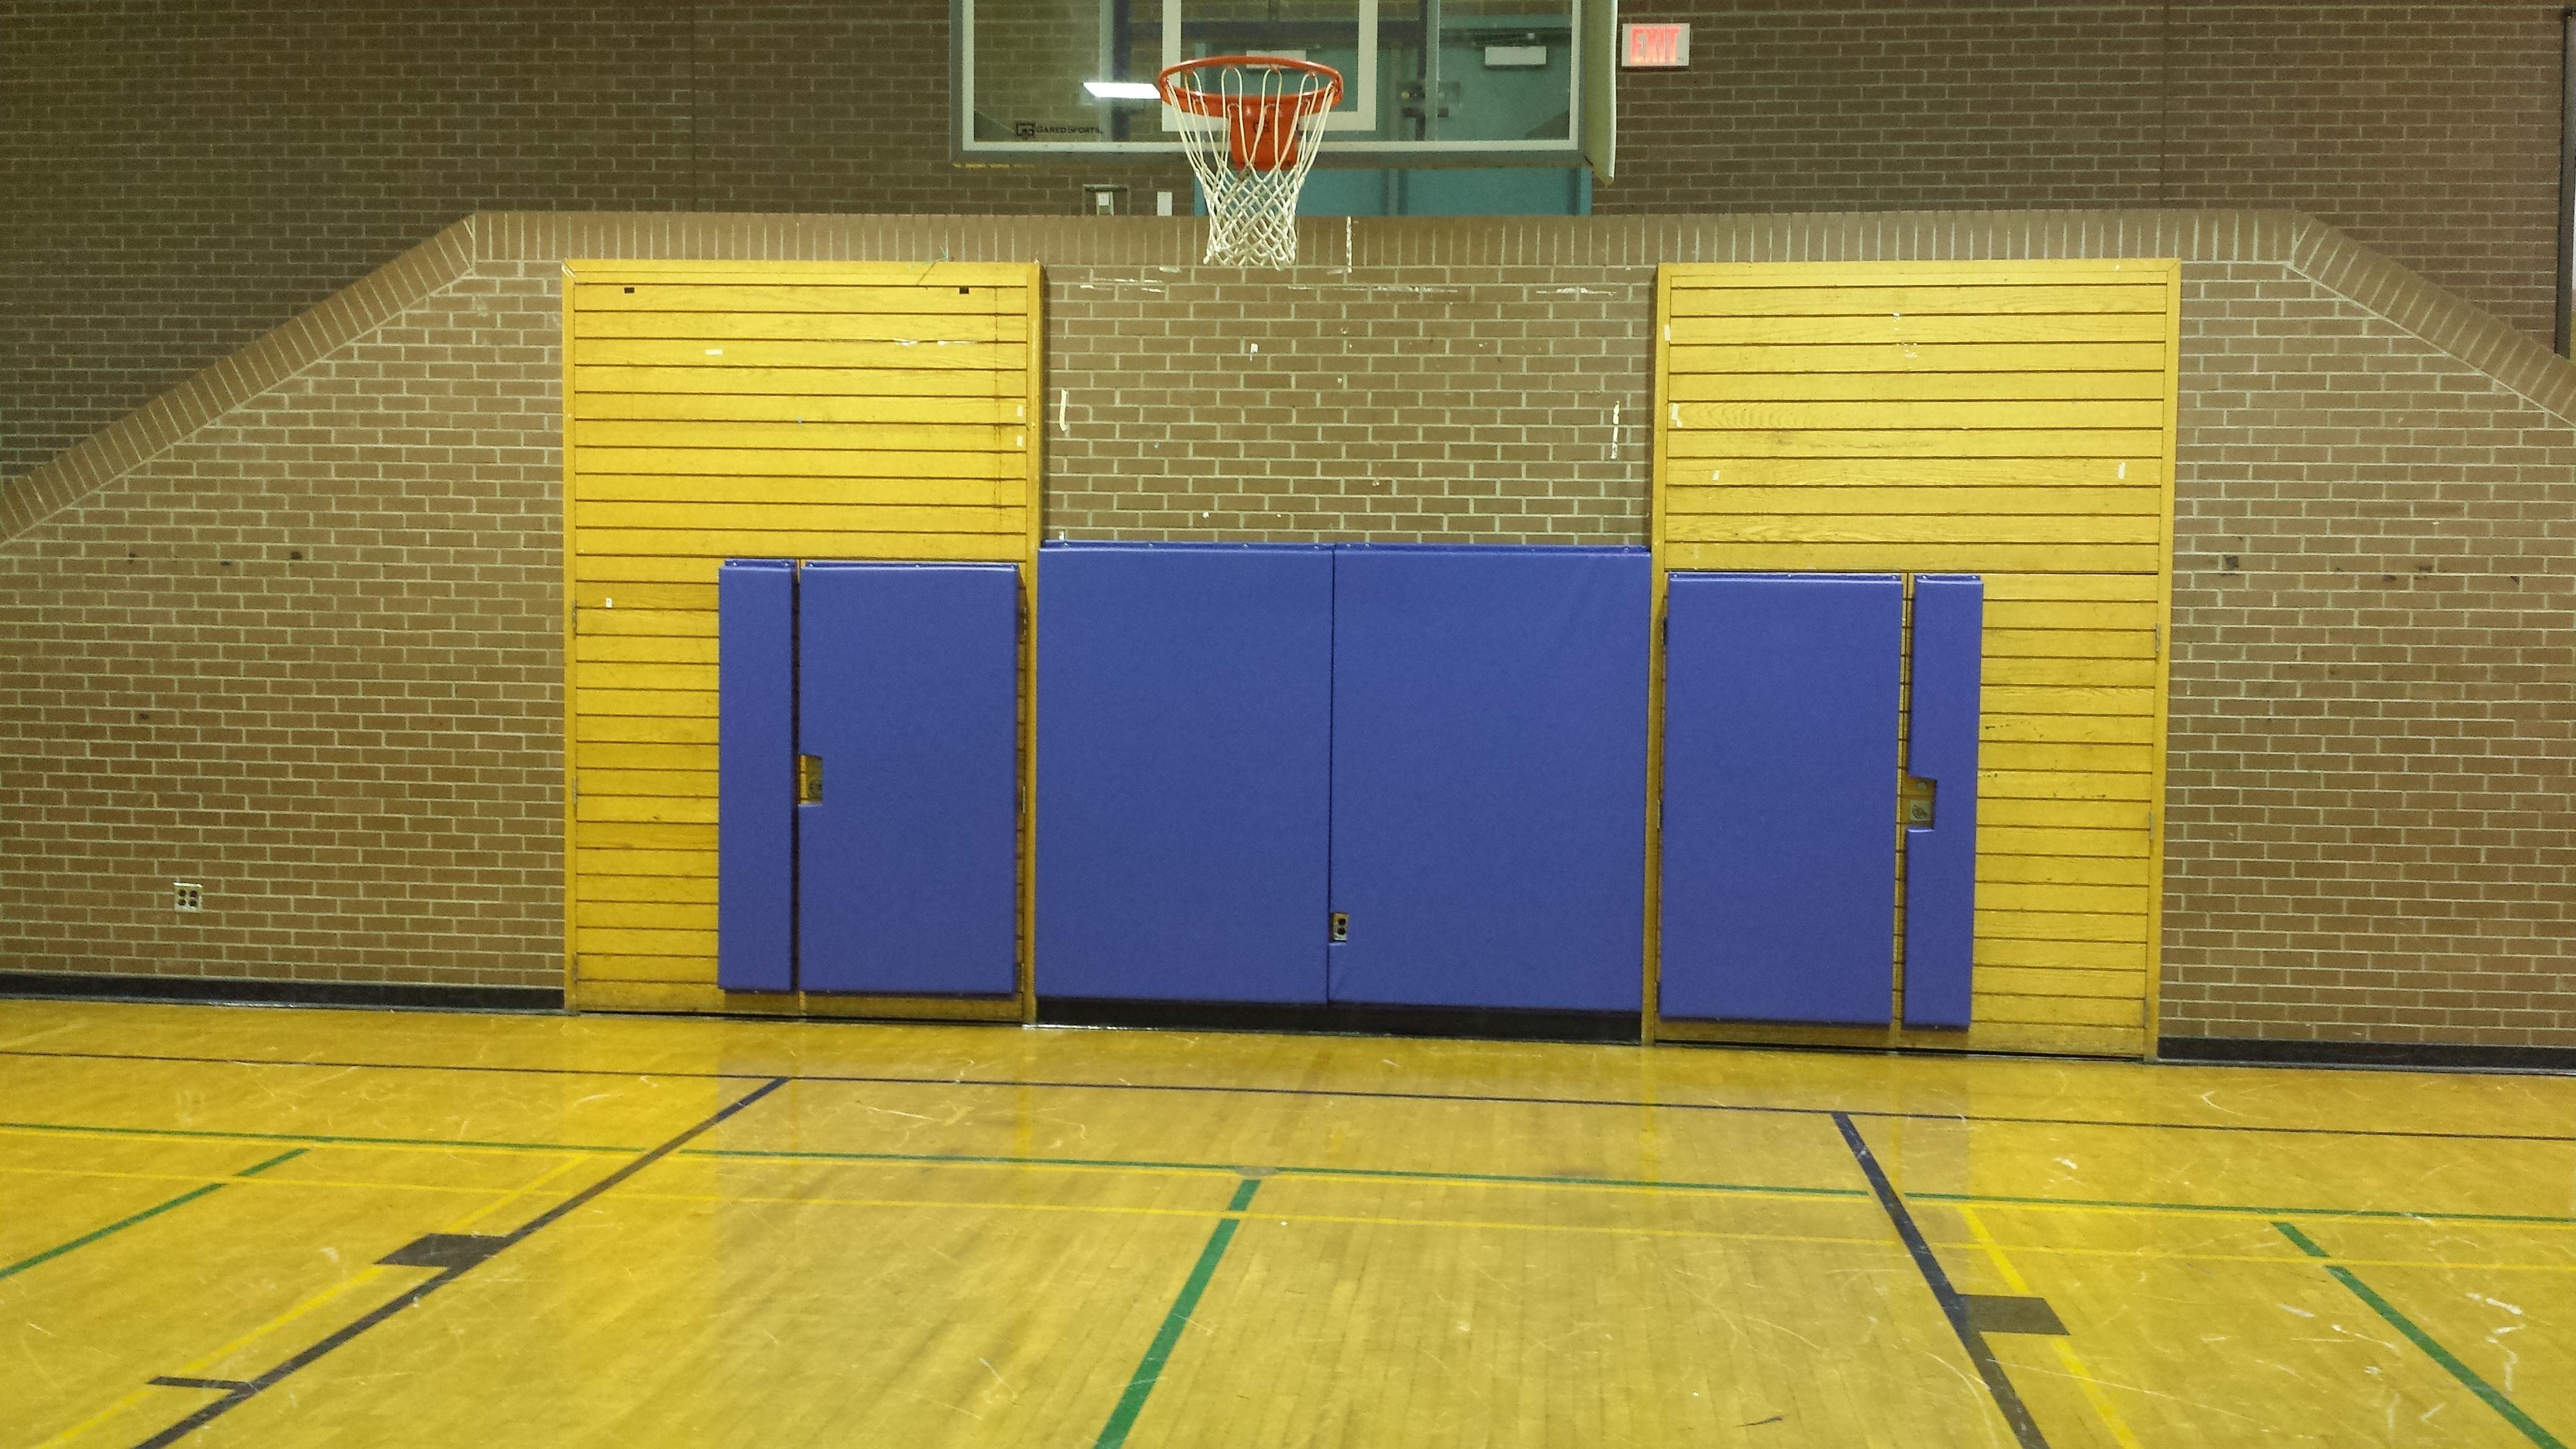 custom-wall-padding-beneath-basketball-net-garnet-williams-community-centre.jpg